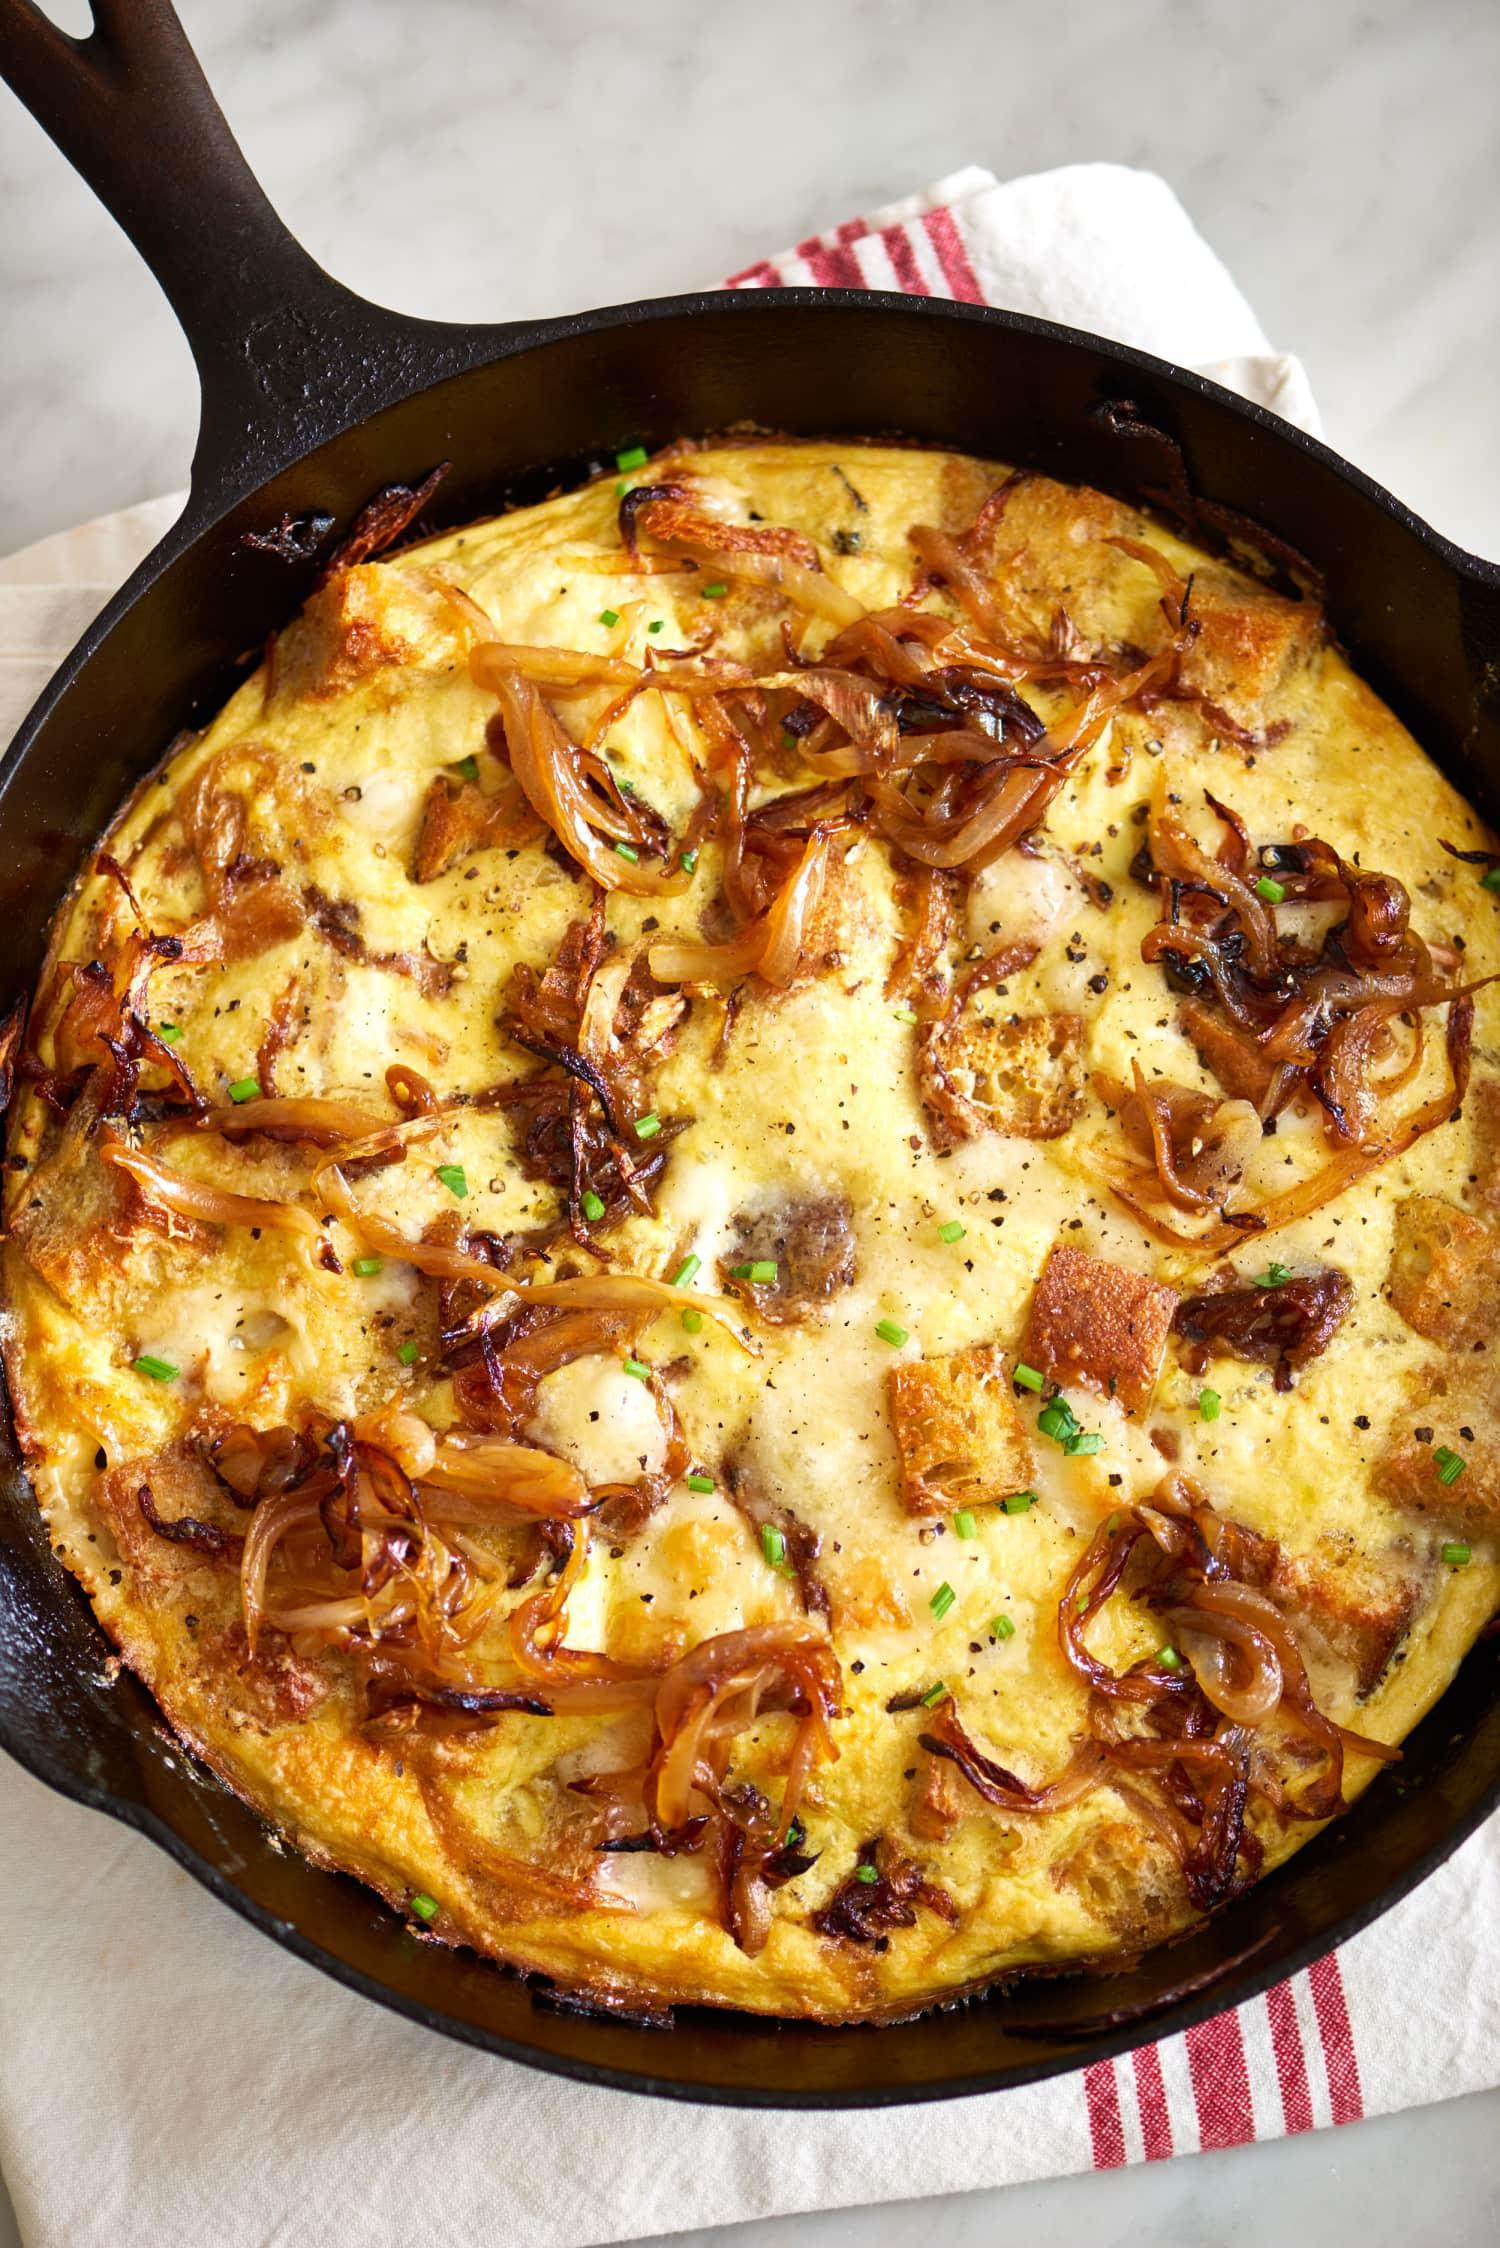 Recipe: French Onion Frittata